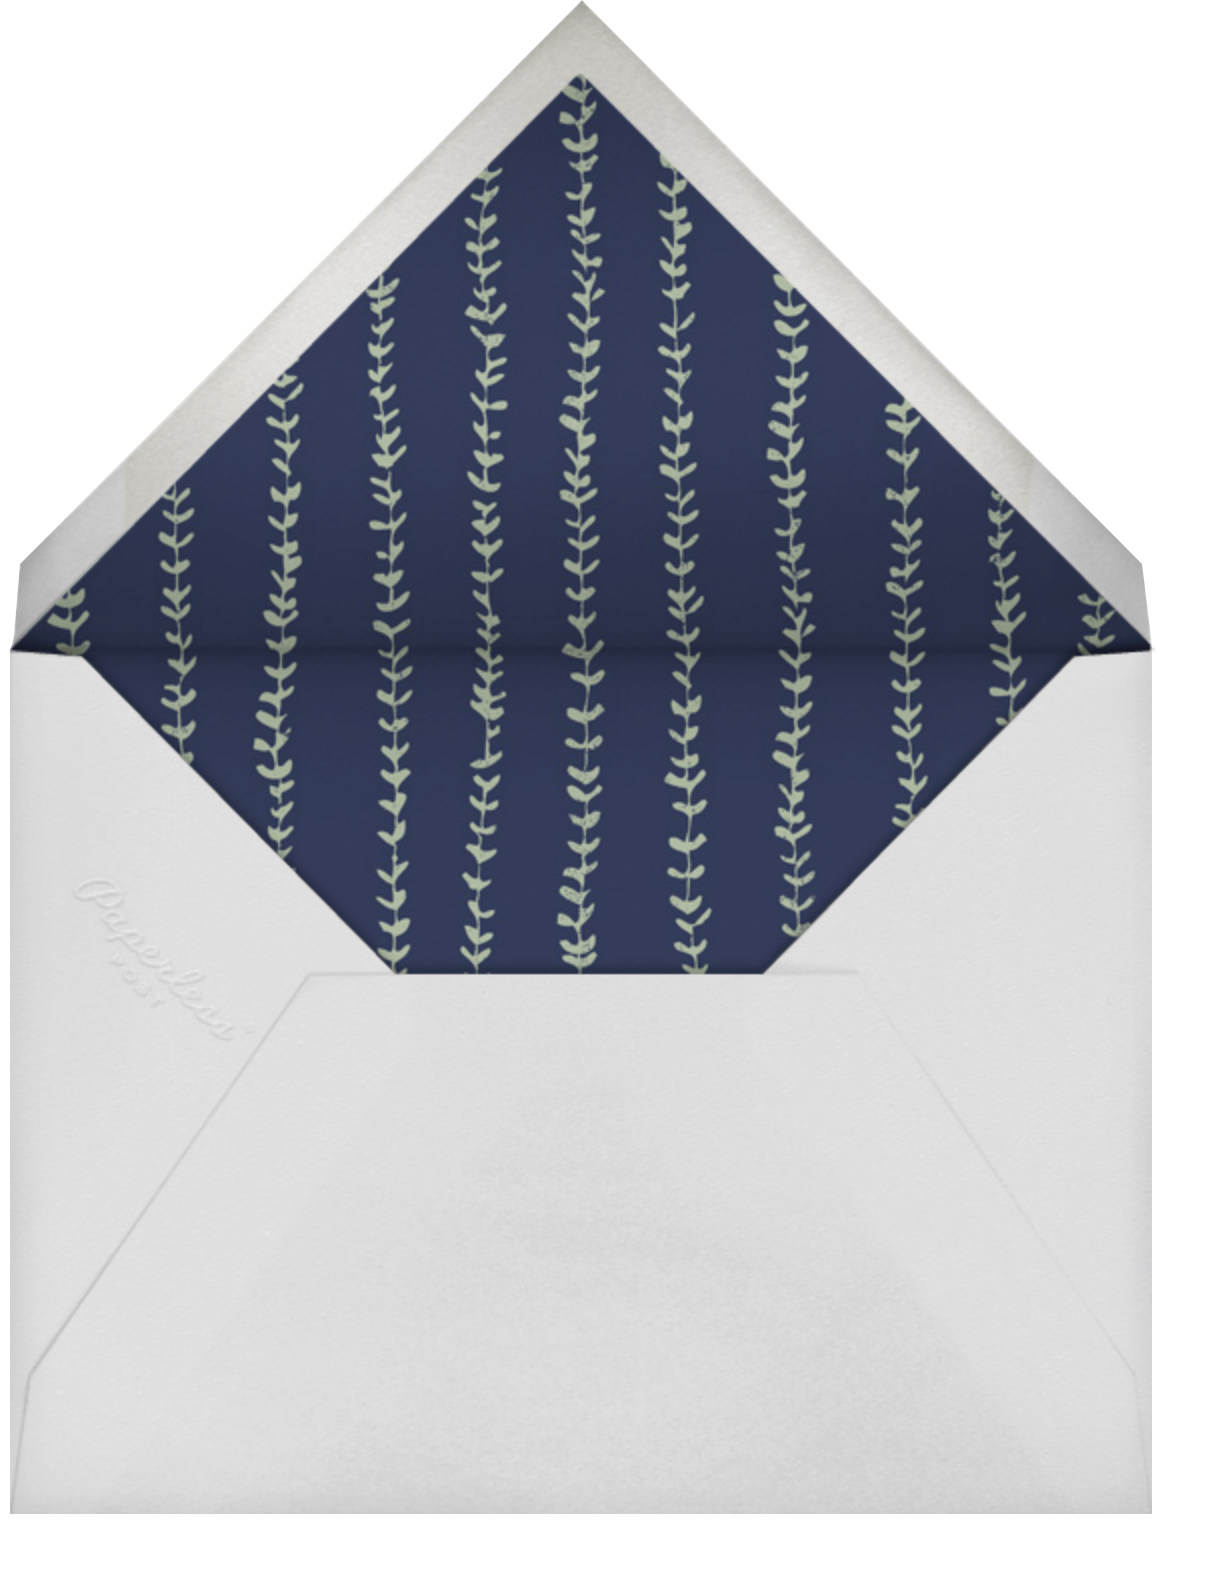 Thankful Photo - Wheat - Paperless Post - Envelope